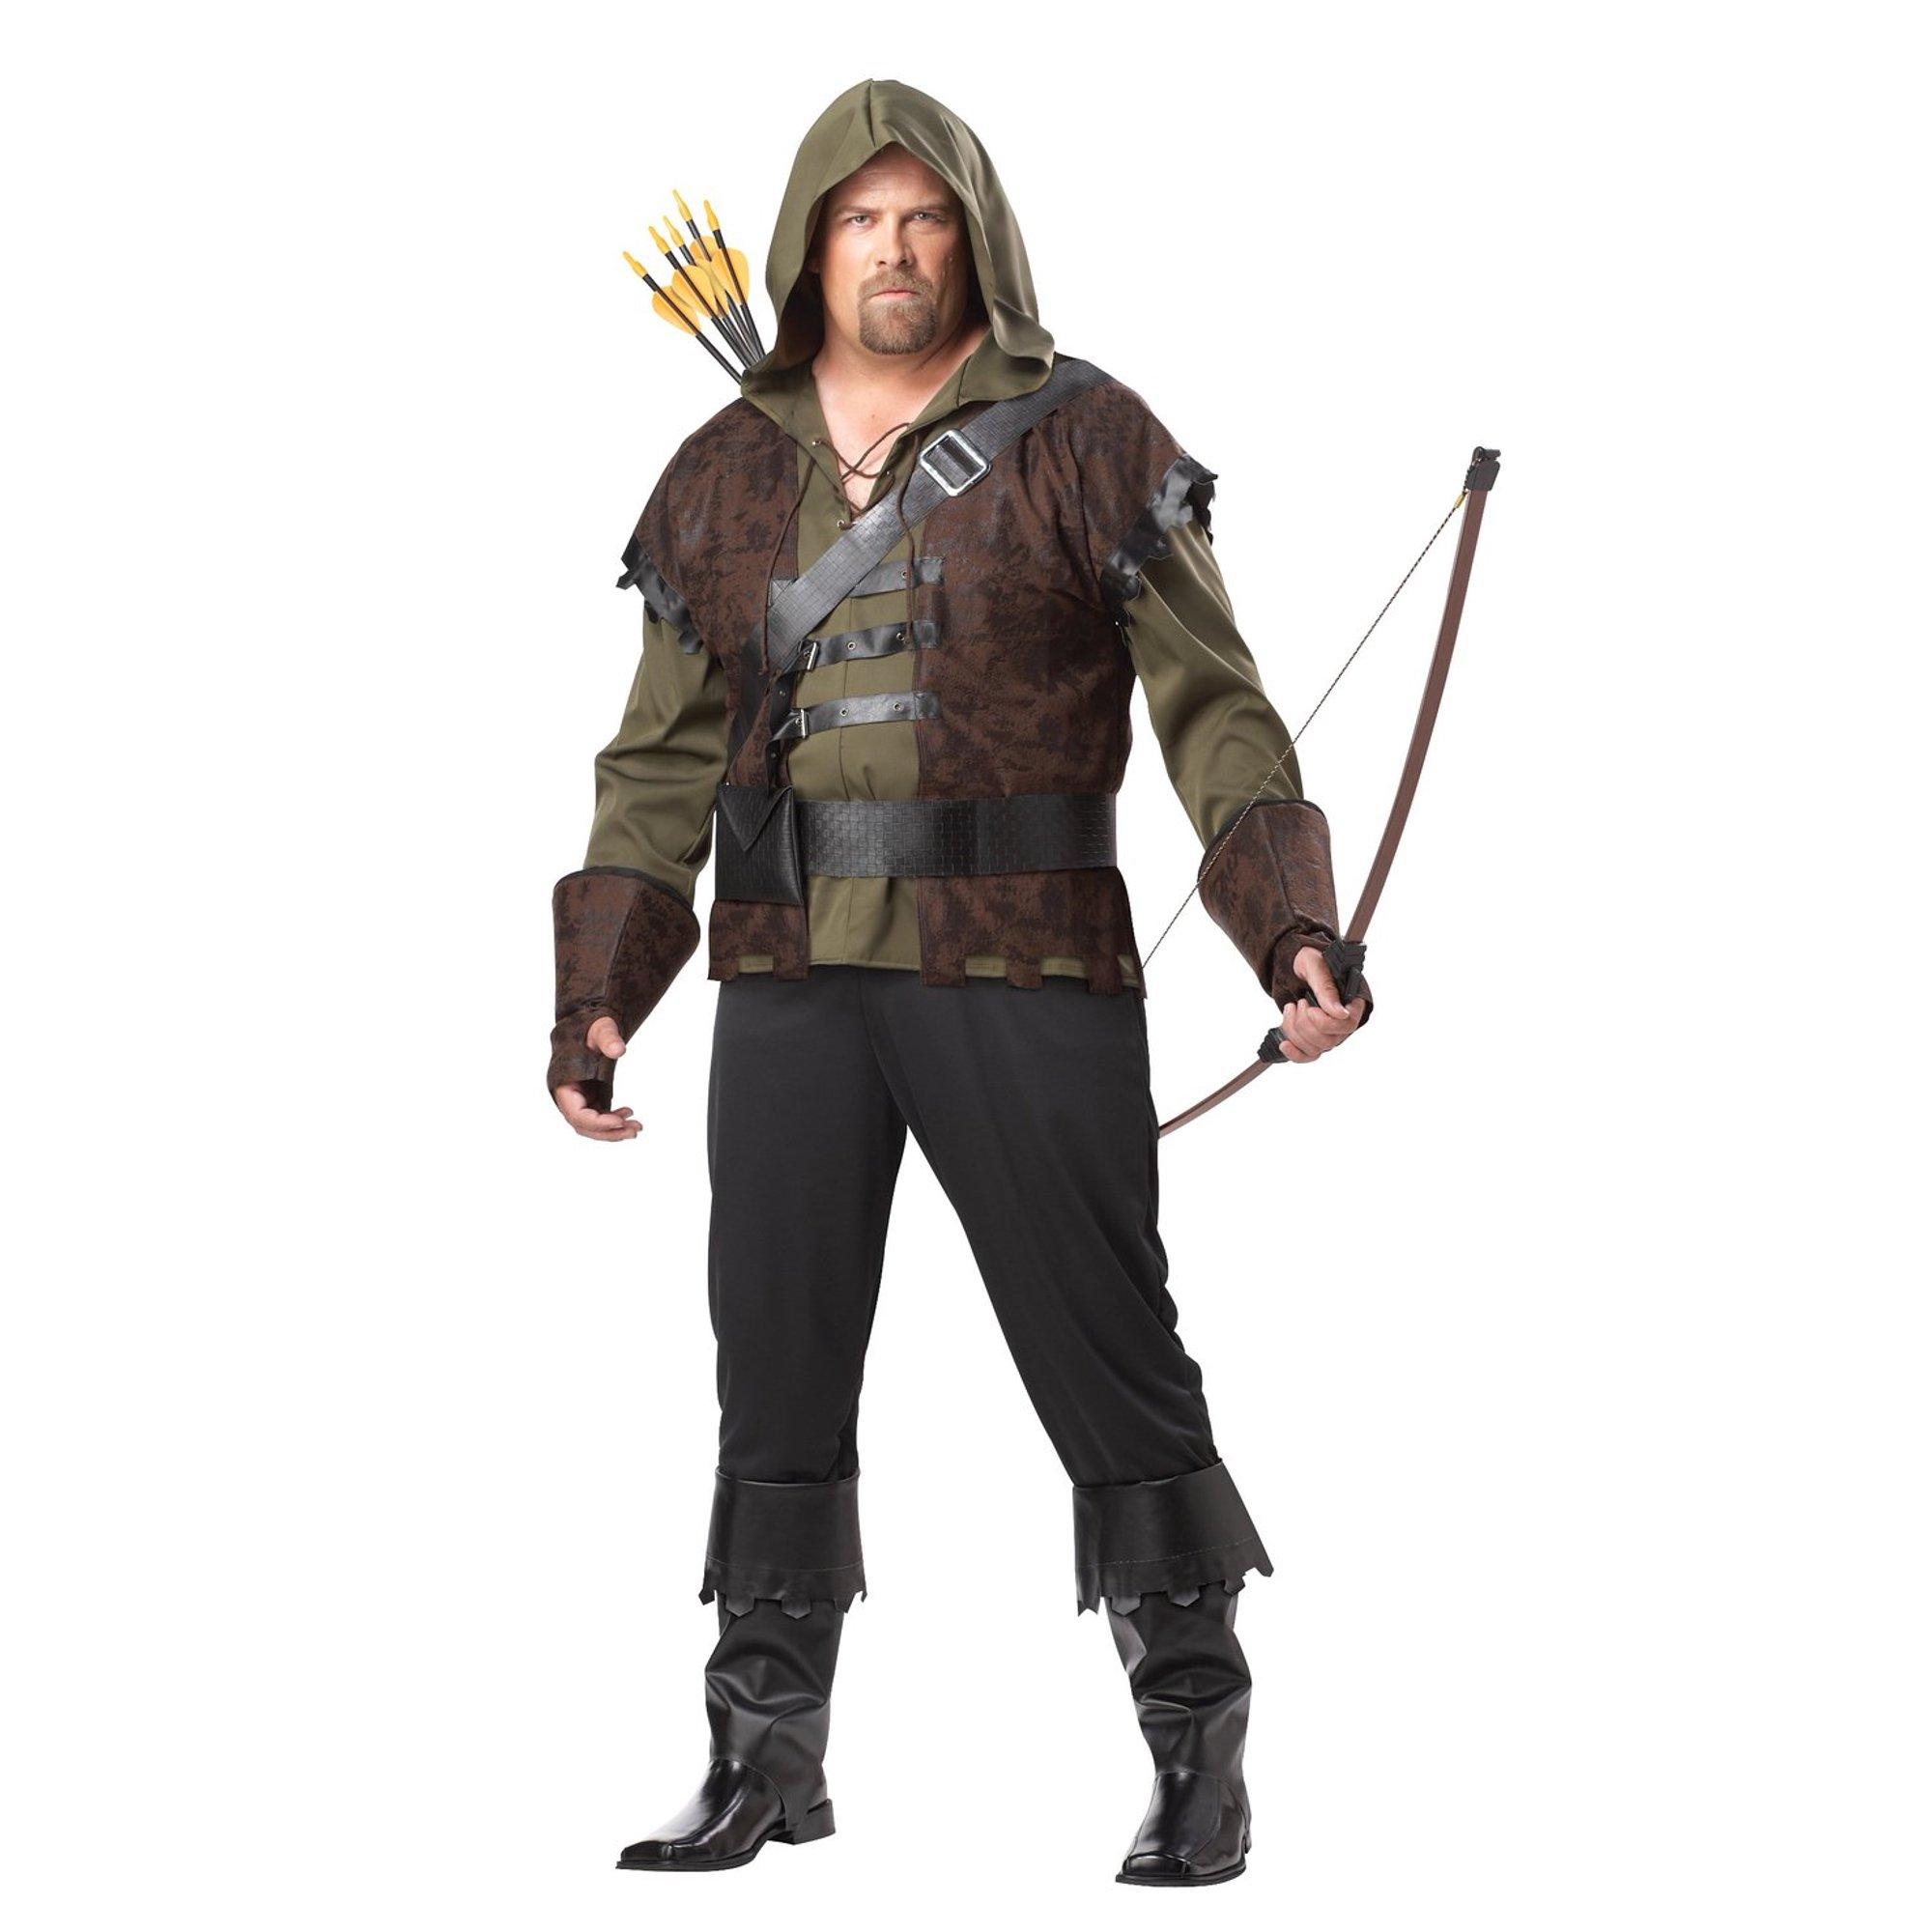 035c0679c55 Robin Hood Adult Costume Plus XX-Large